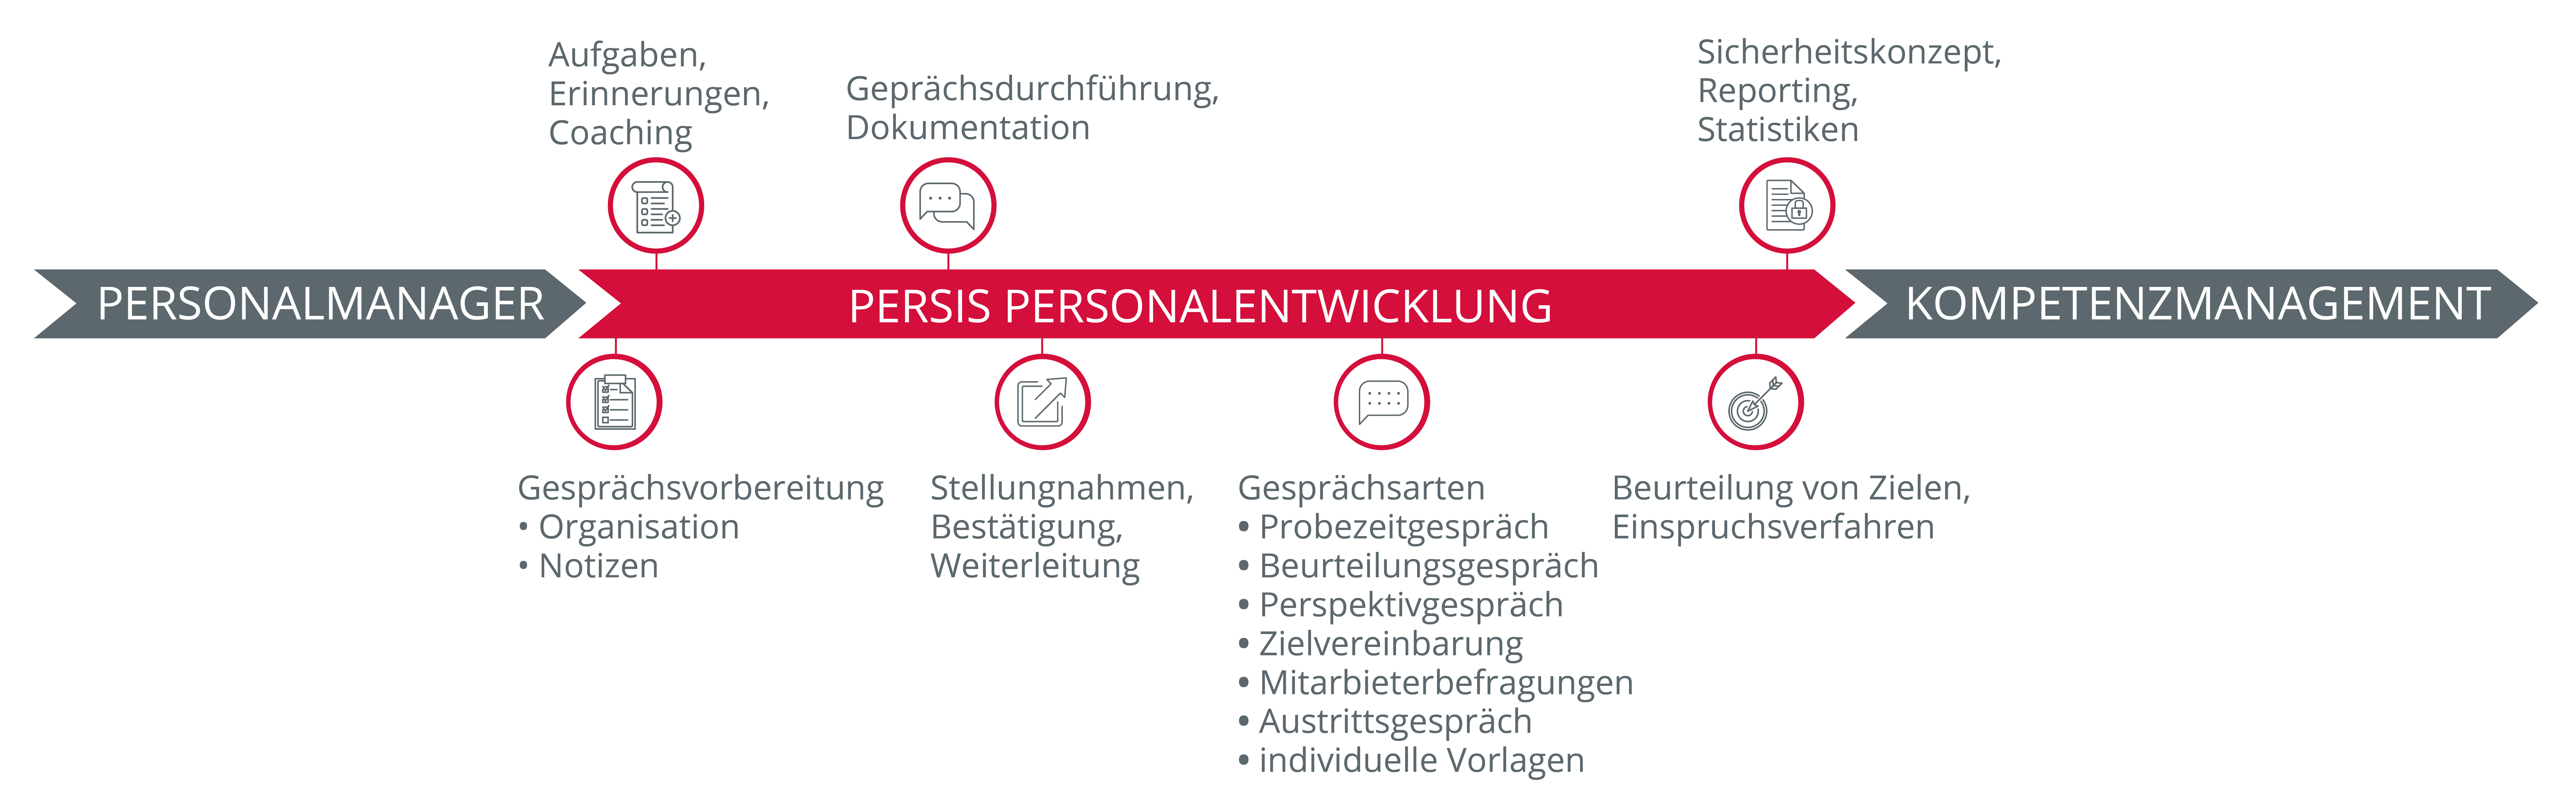 Prozessgrafik Persis Personalentwicklung